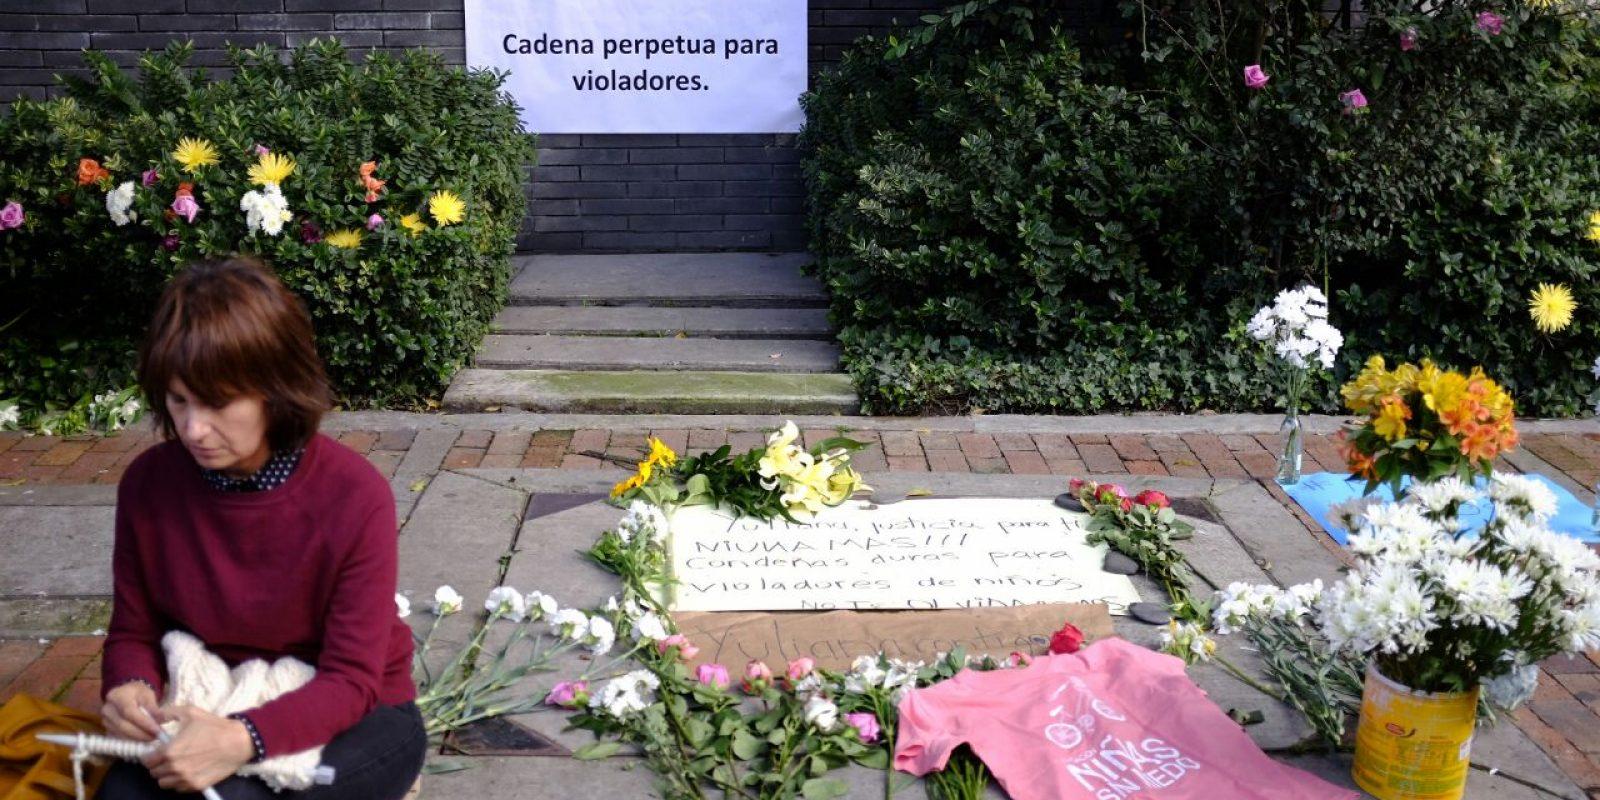 Rafael Uribe Noguera. Imagen Por: Juan Pablo Pino - Publimetro